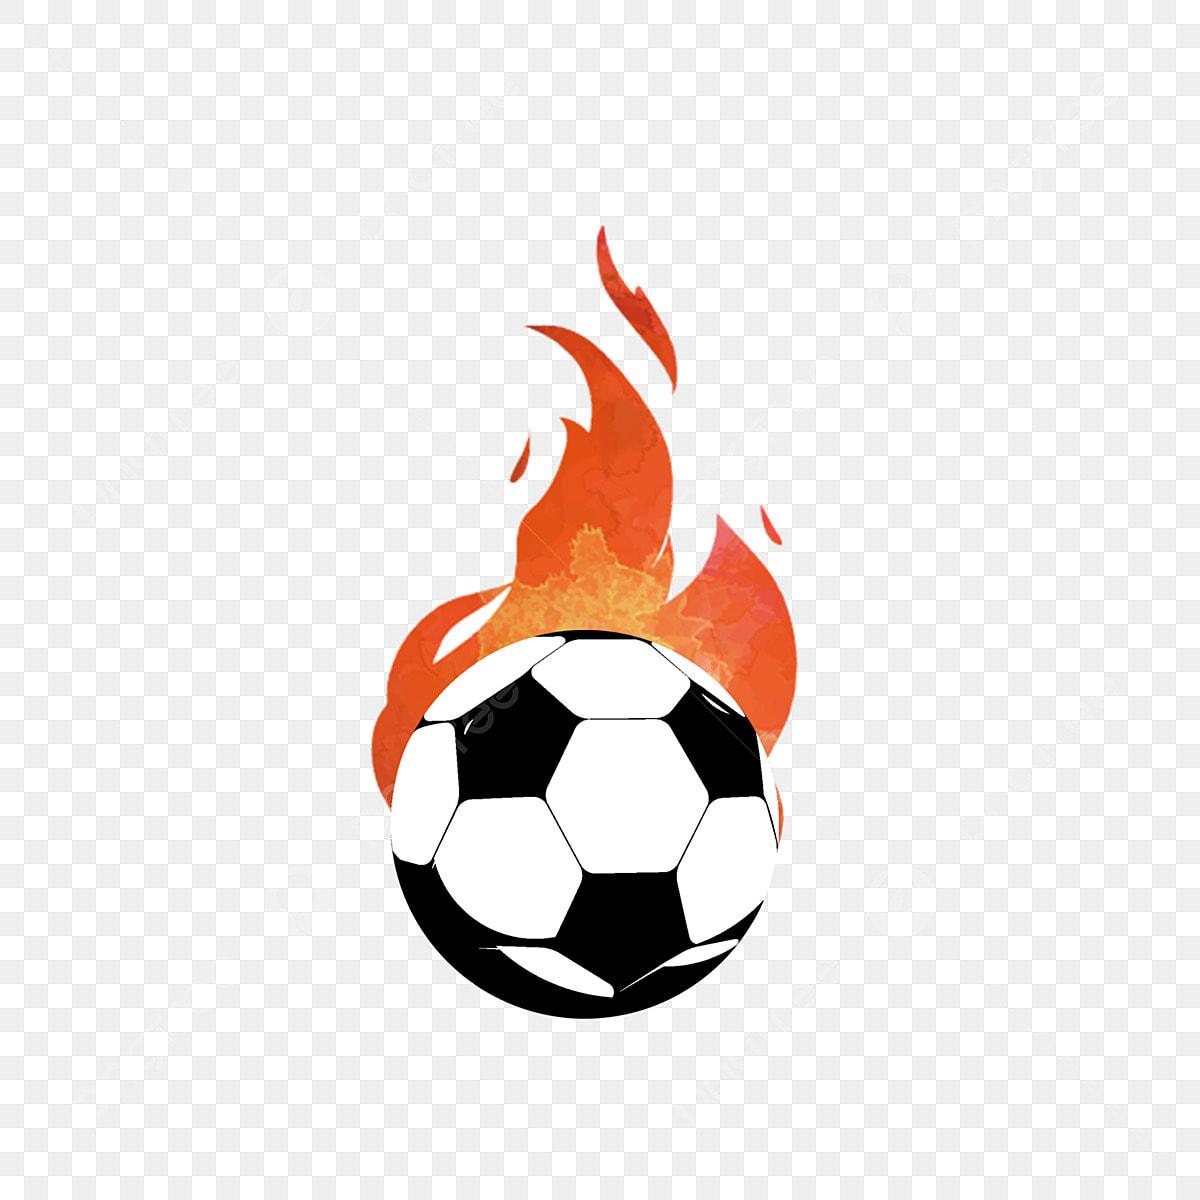 Kartun Tangan Ditarik Bola Sepak Perlawanan Bola Sepak